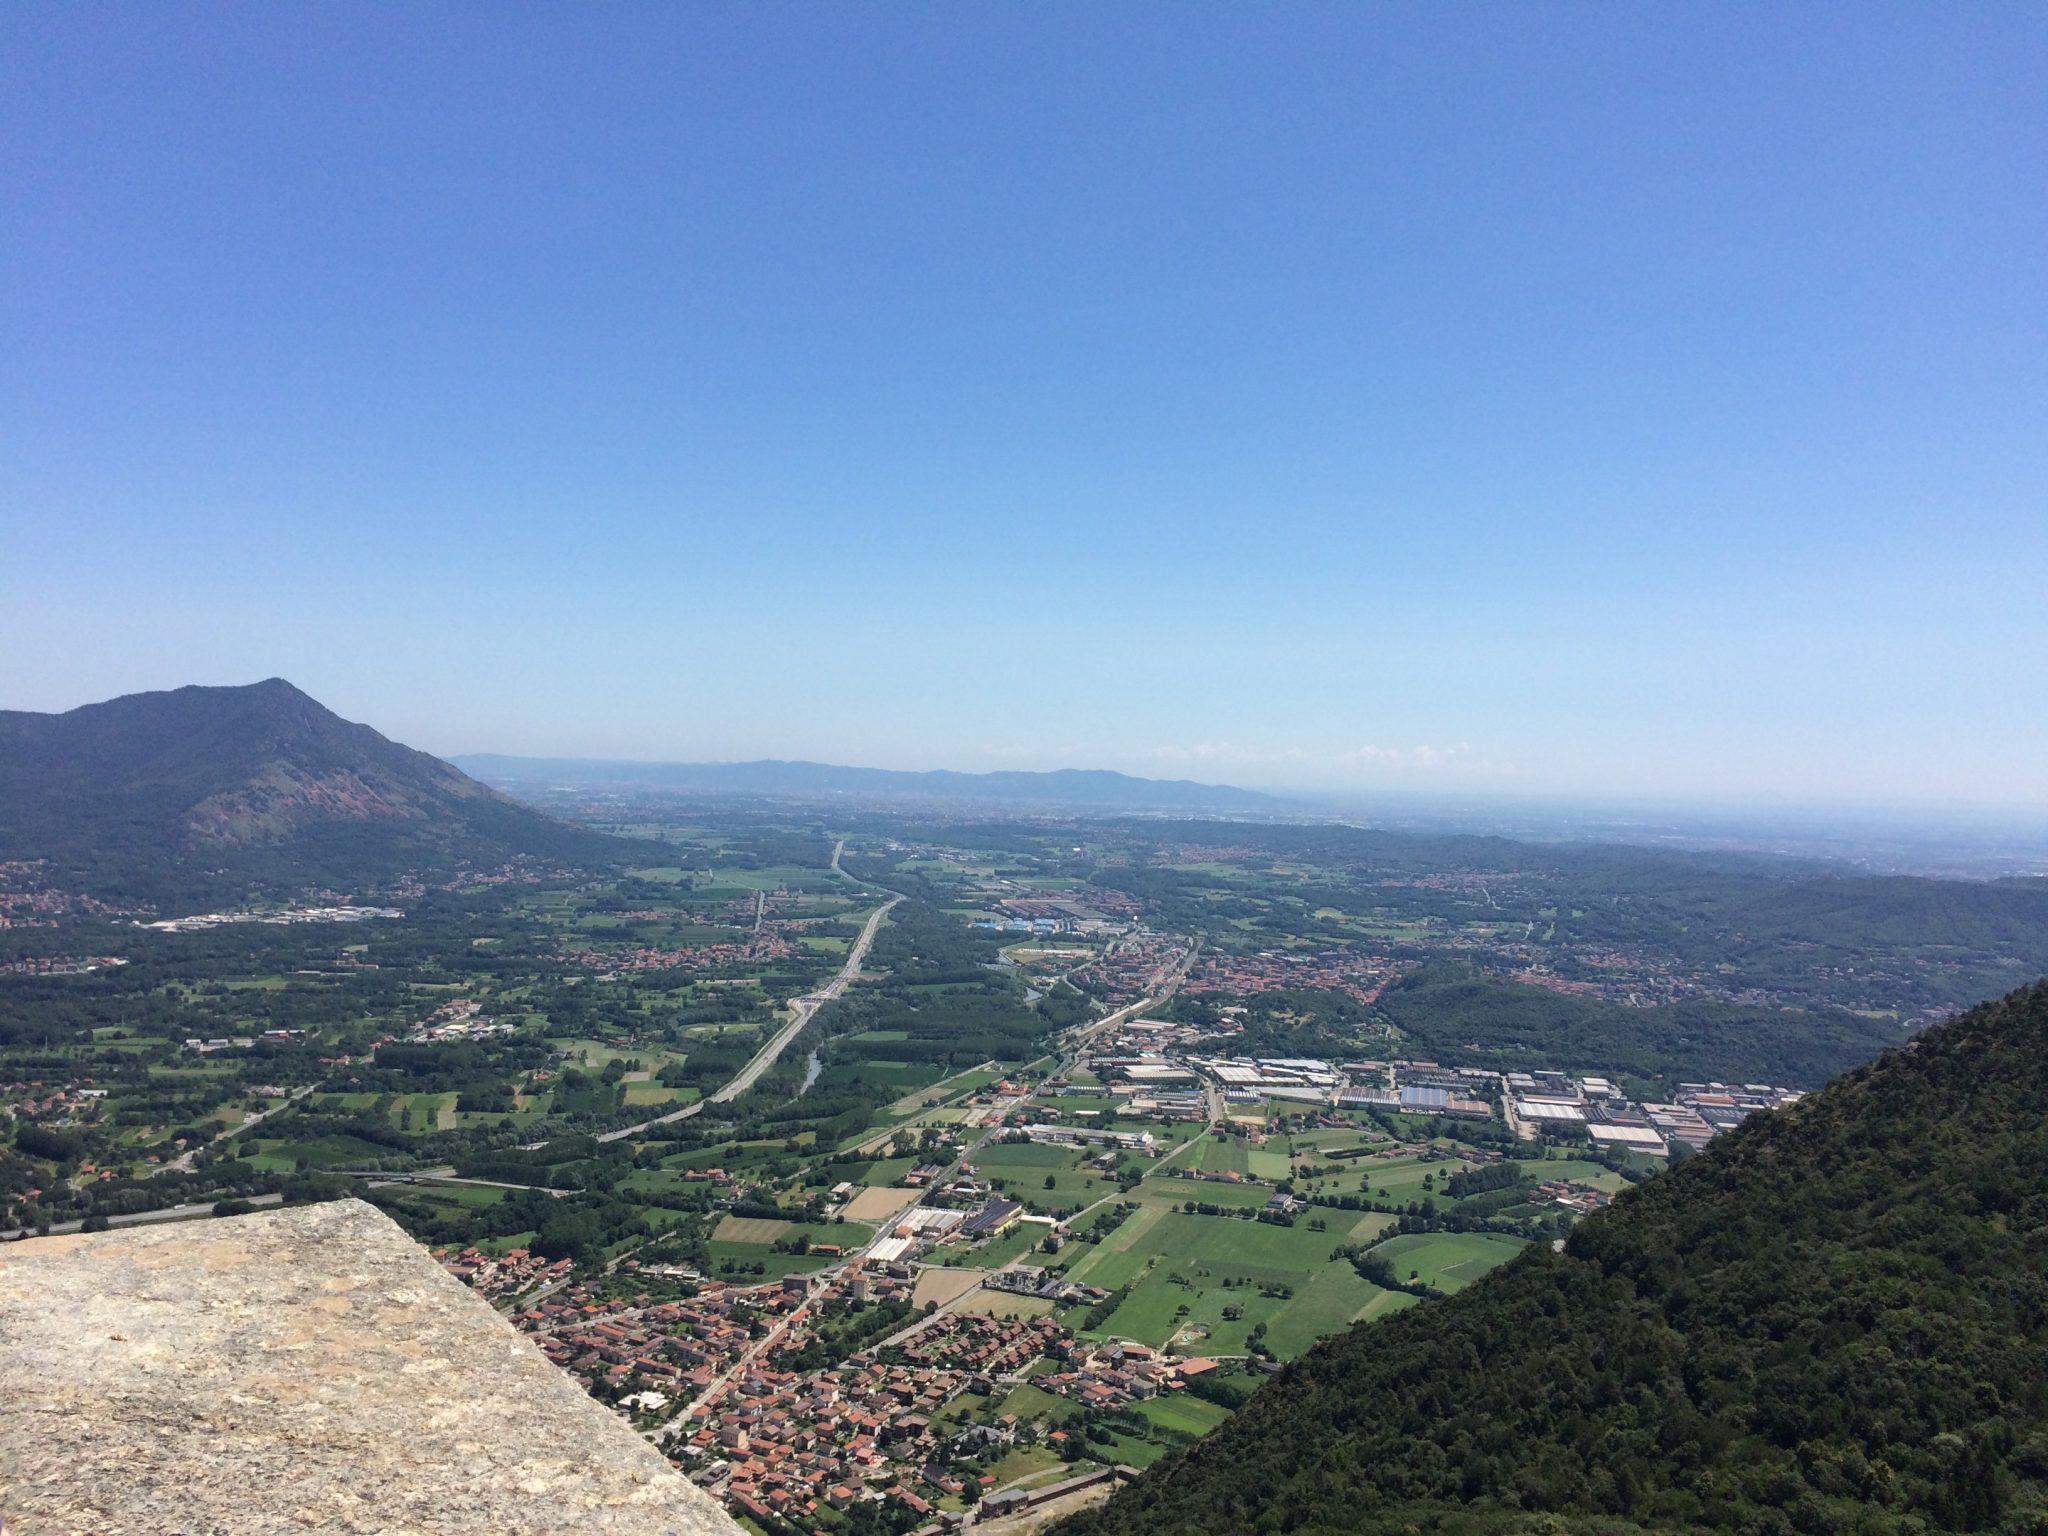 img 4236 - Sacra di San Michele: a monastery on the rocks